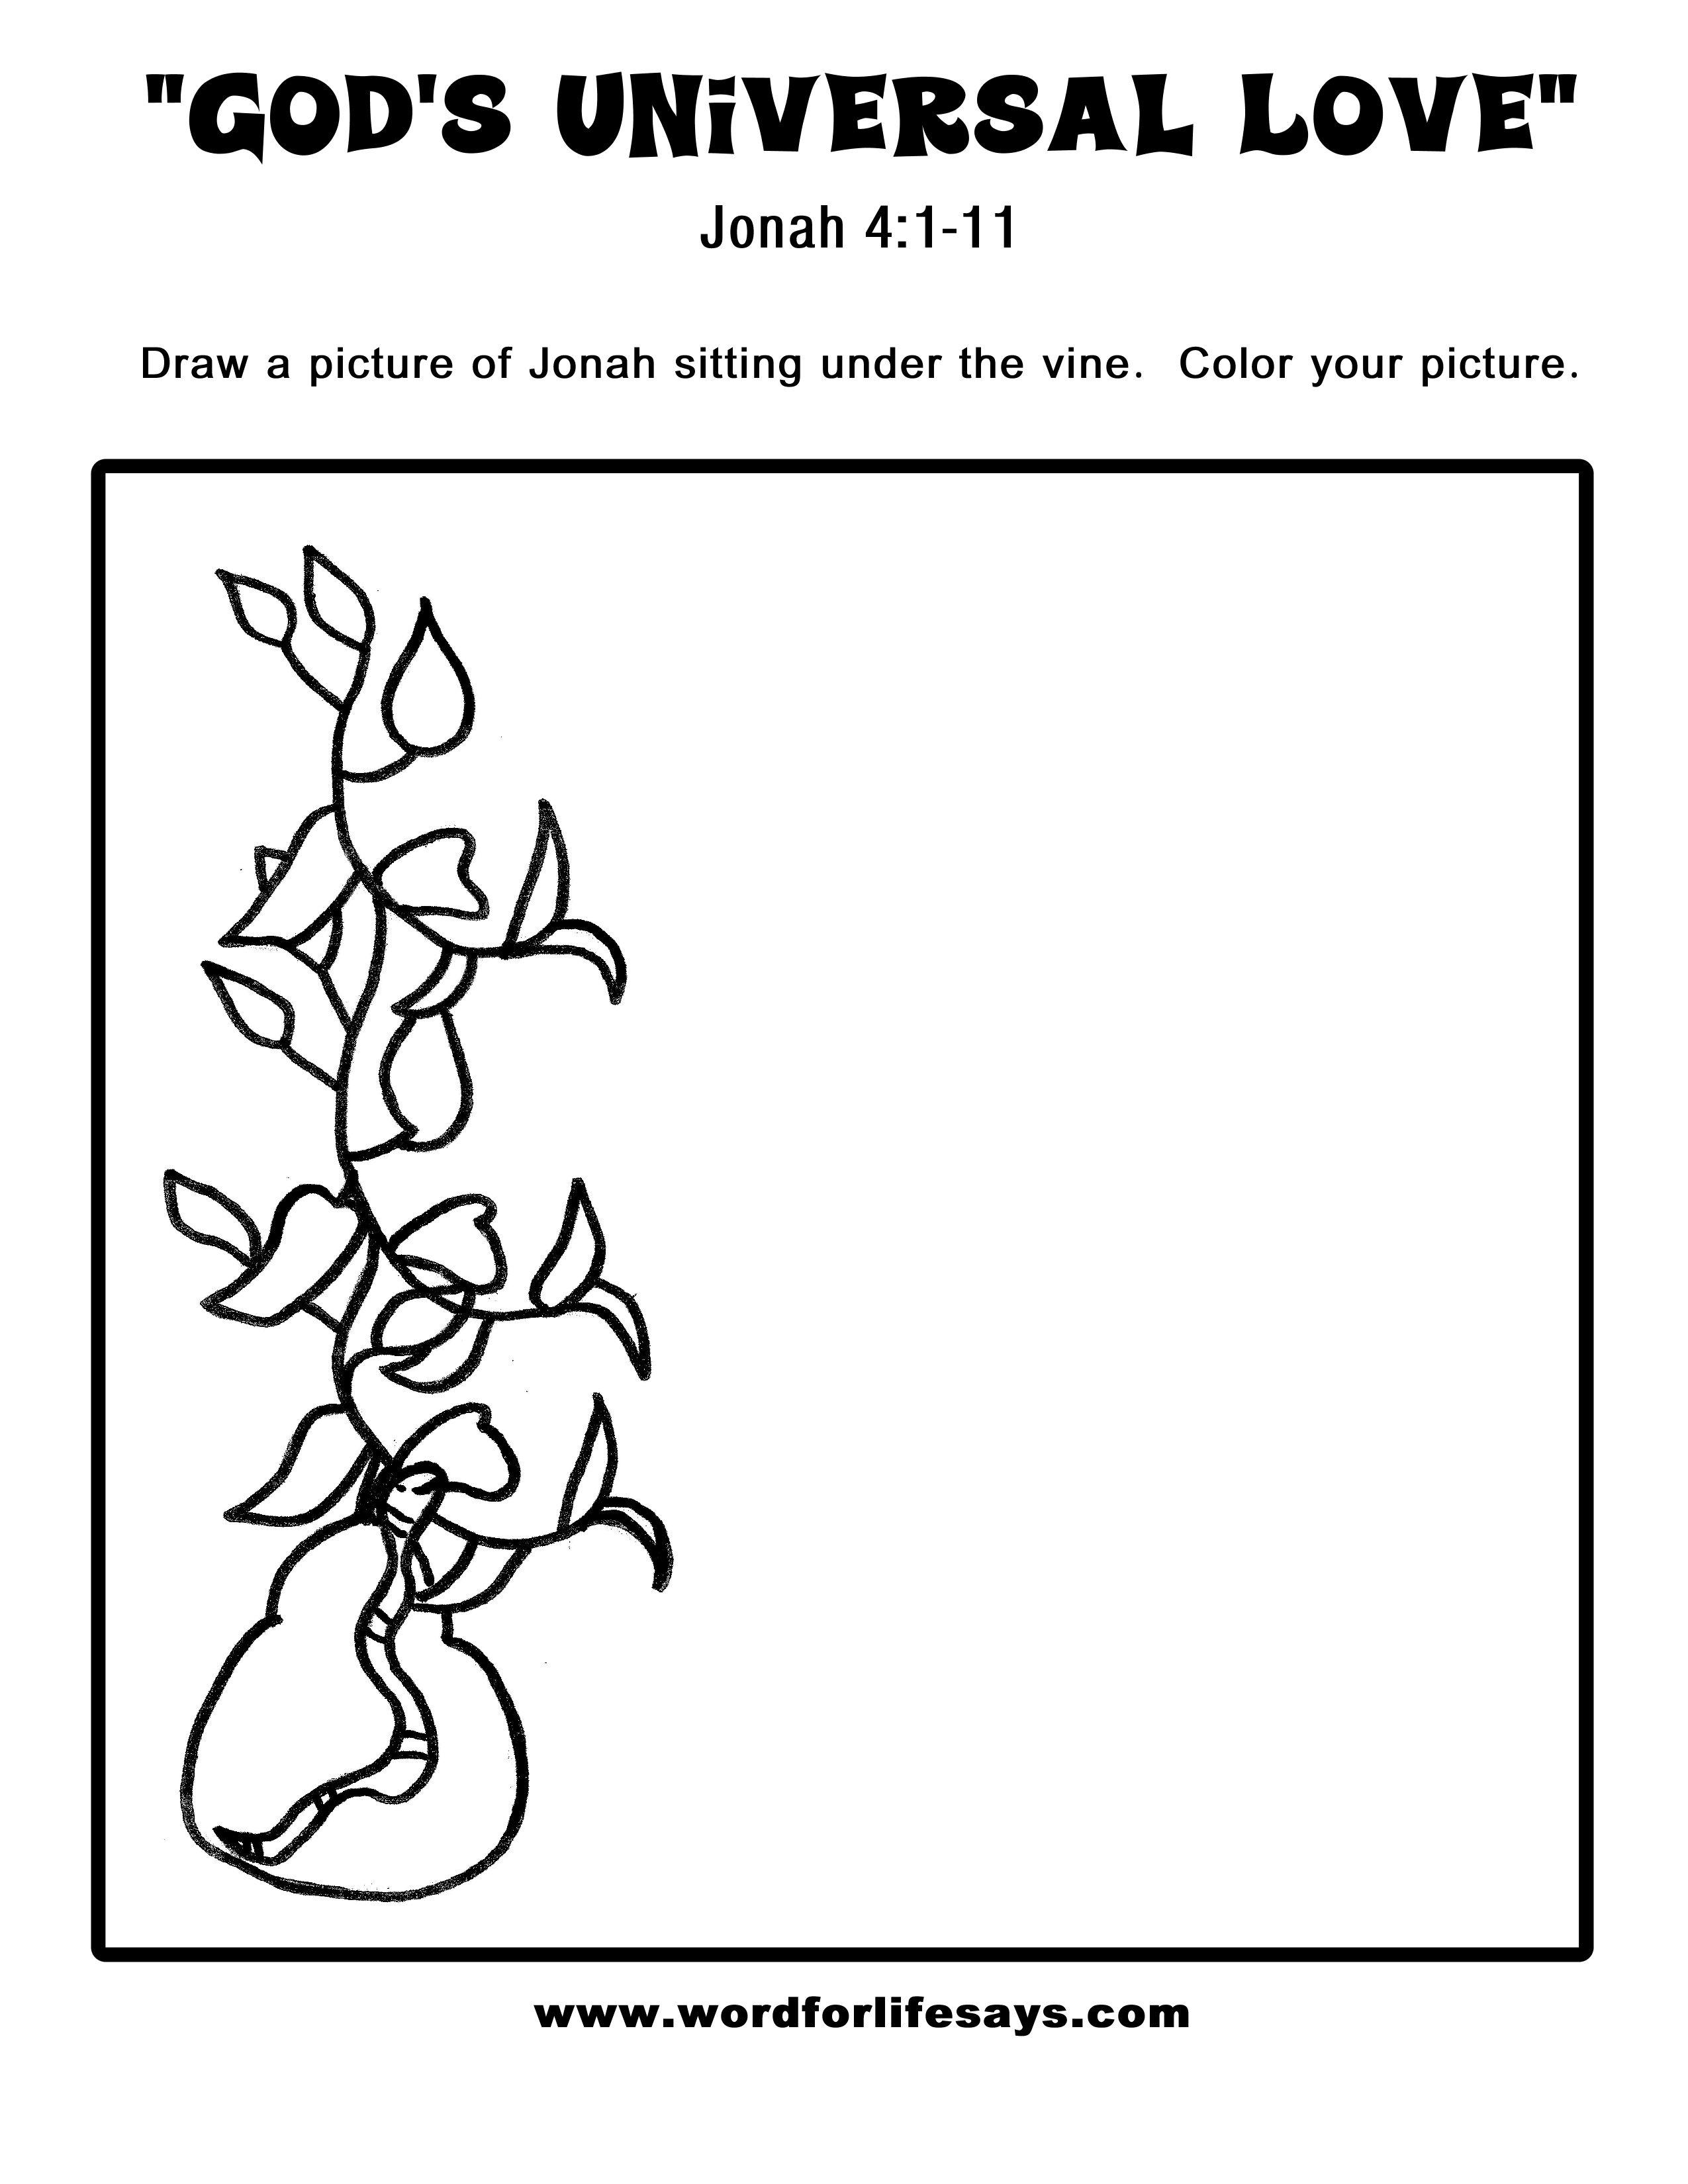 god u0027s universal love u201d sunday lesson summary for jonah 4